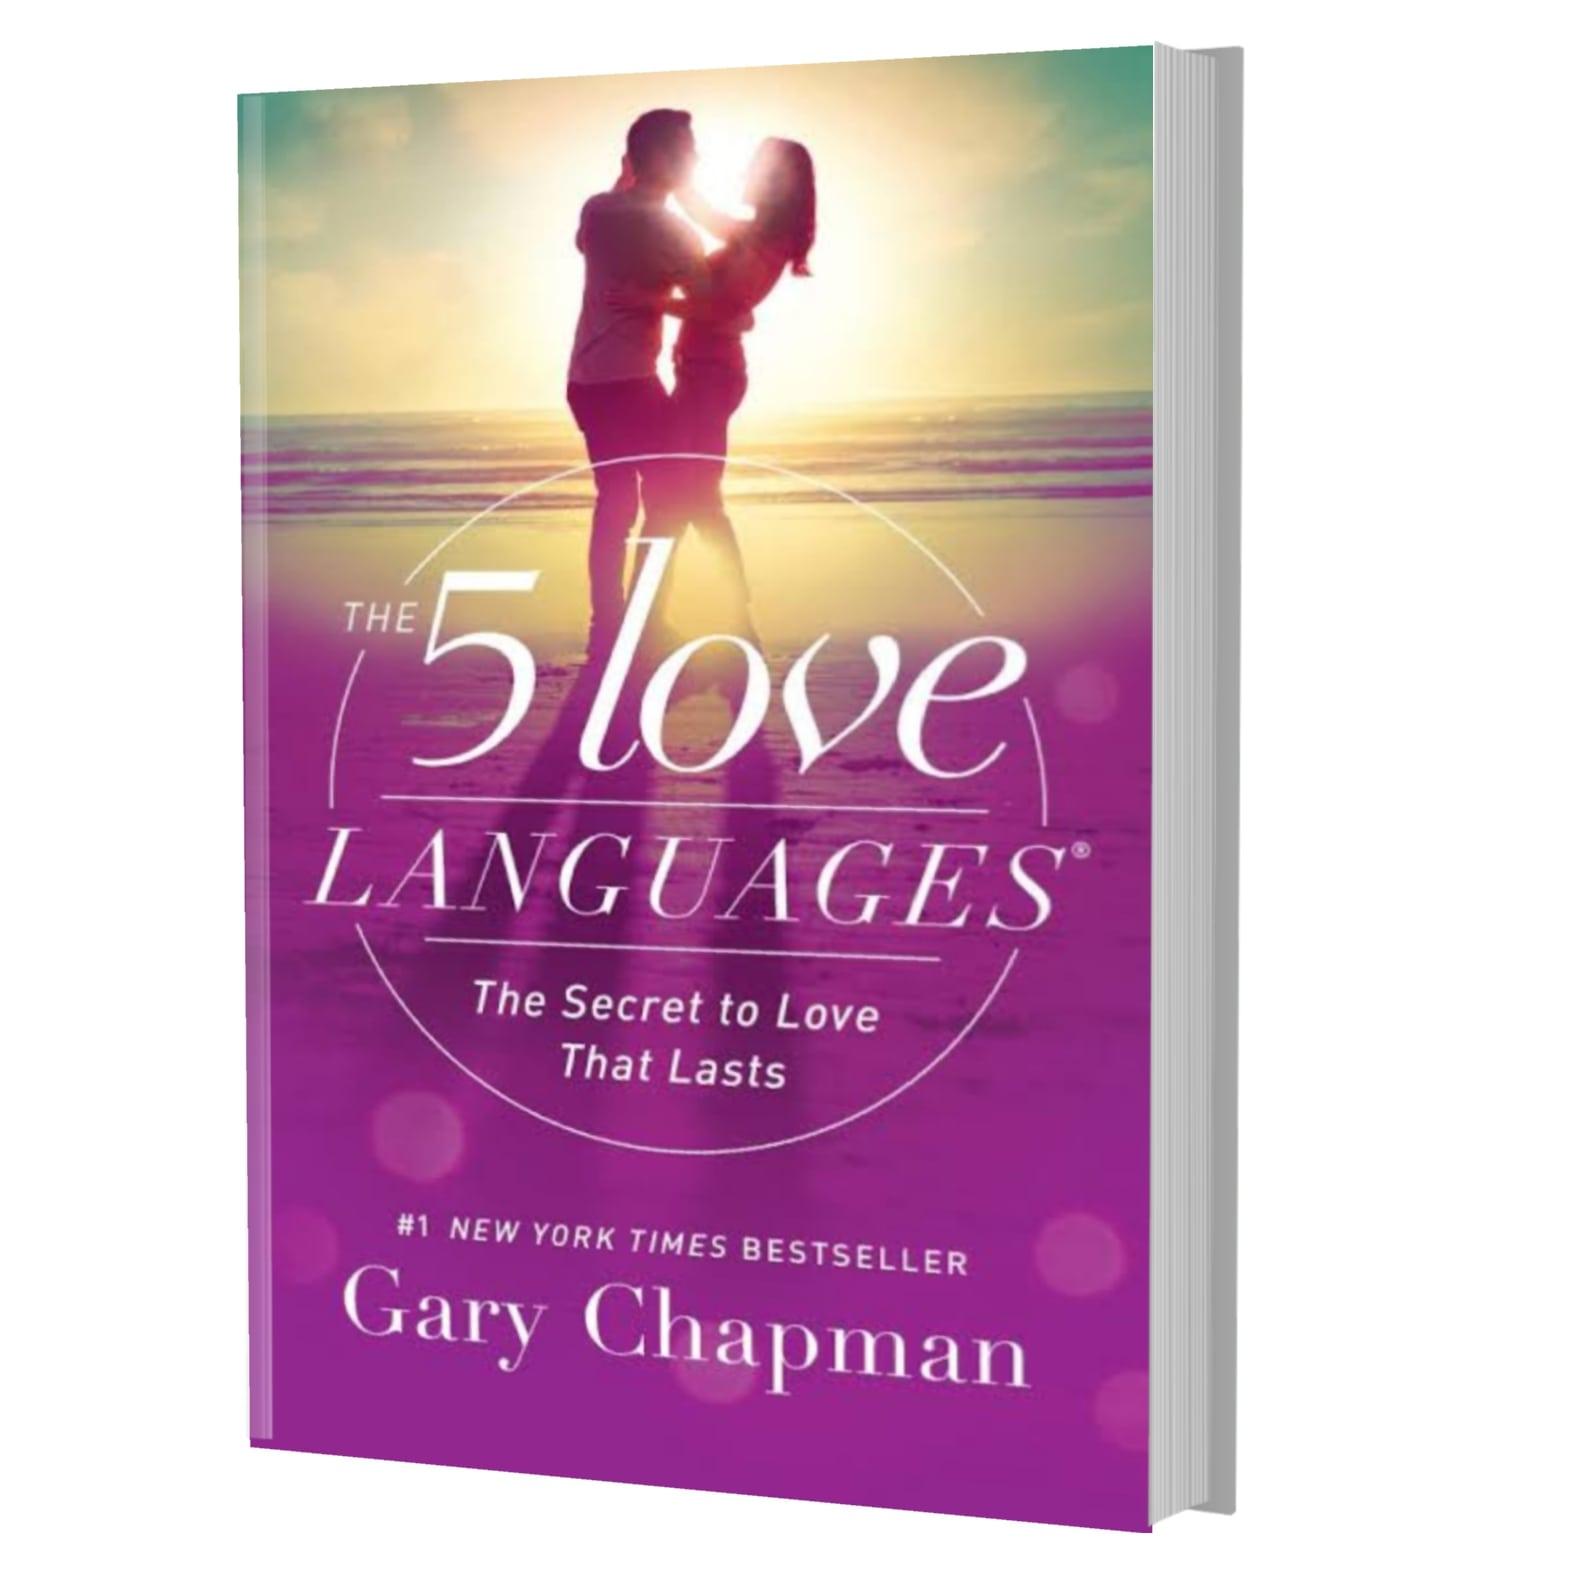 The 5 love languages- Gary Chapman